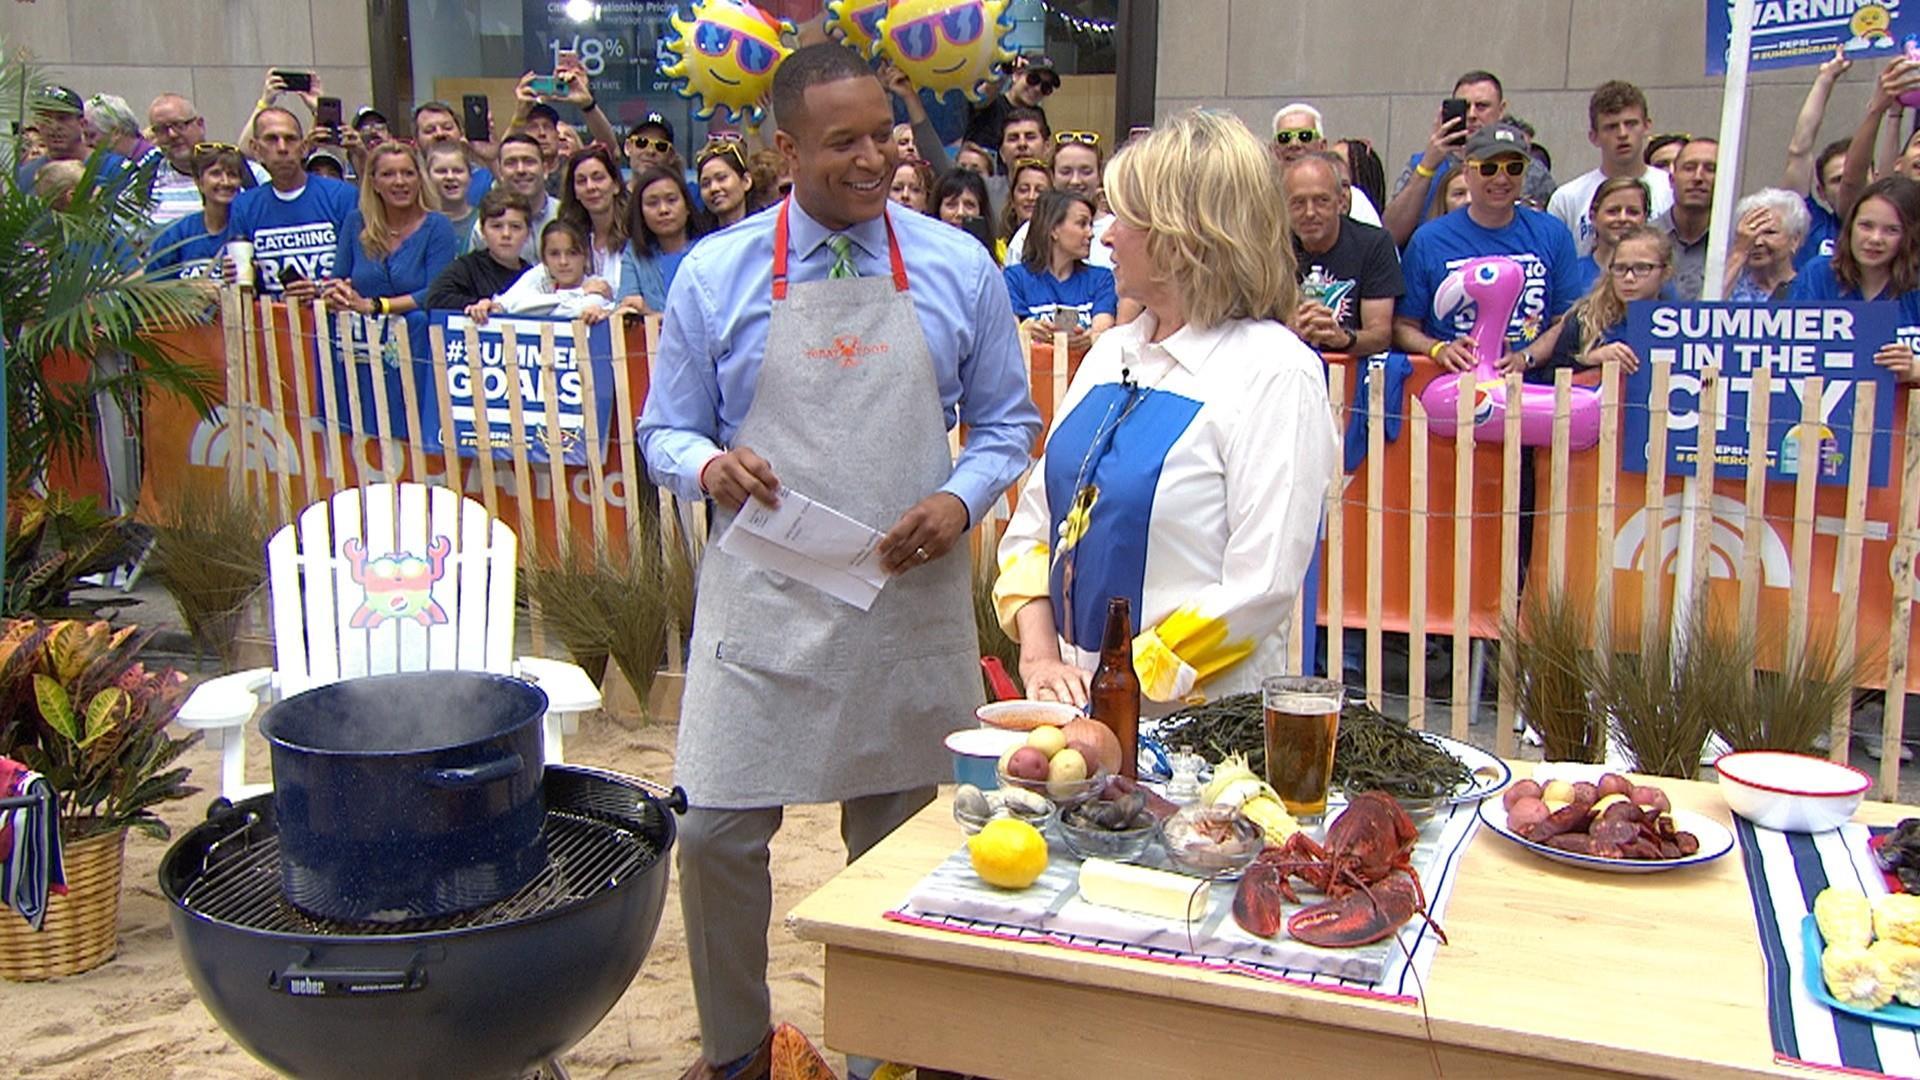 Make Martha Stewart's easy stove-top clambake